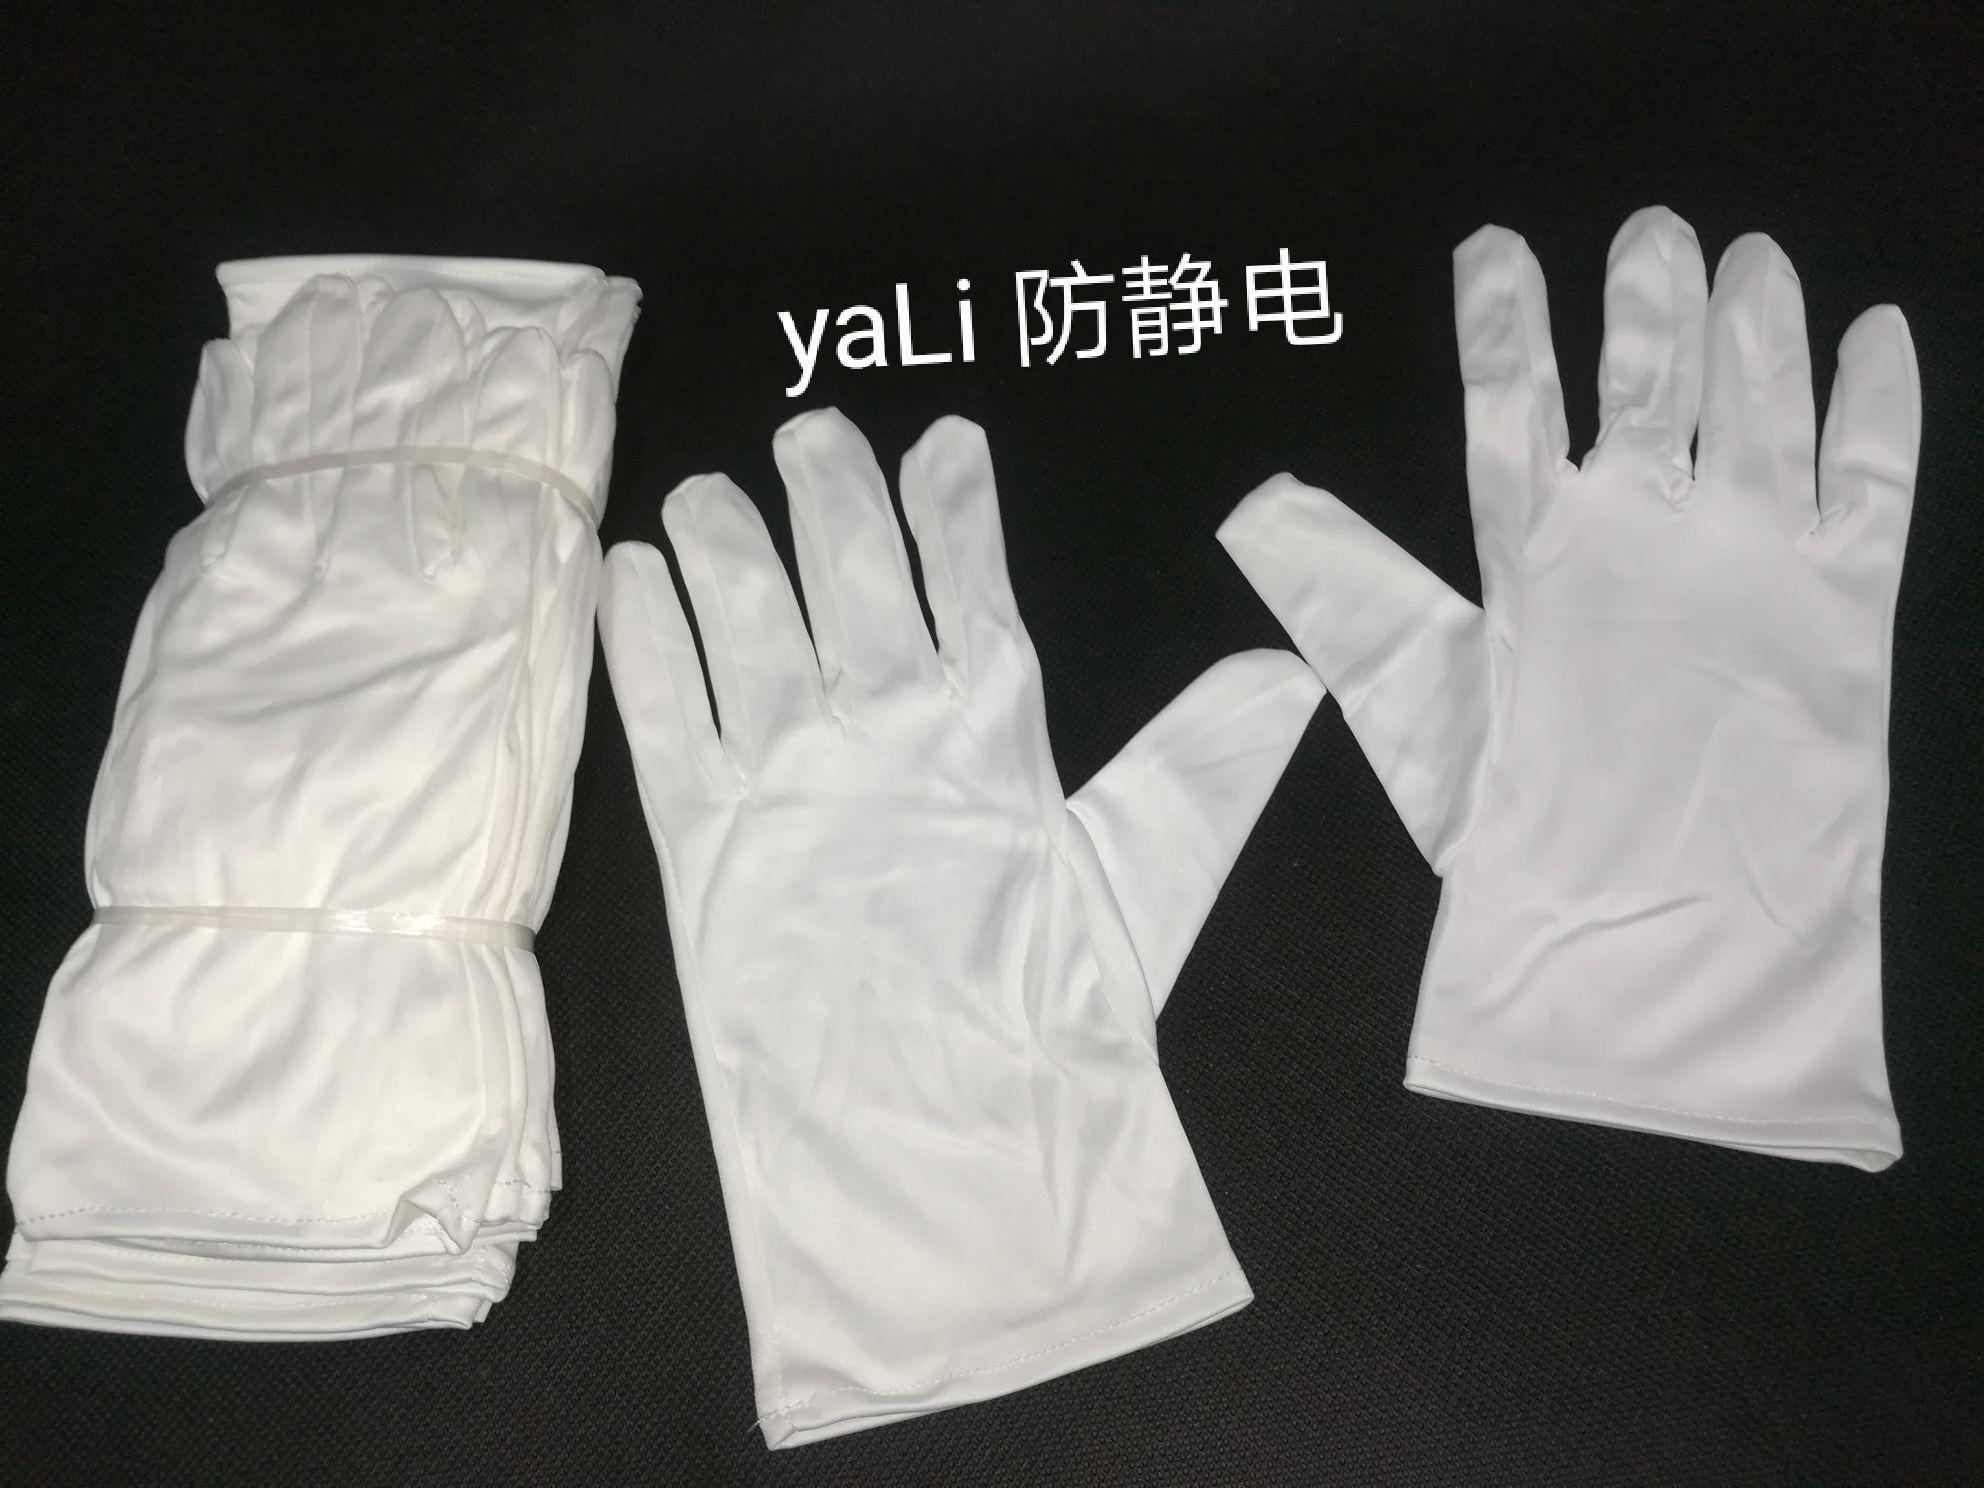 高級超細繊維手袋無塵布手袋磨き眼鏡手袋高精密アクセサリー骨董手袋